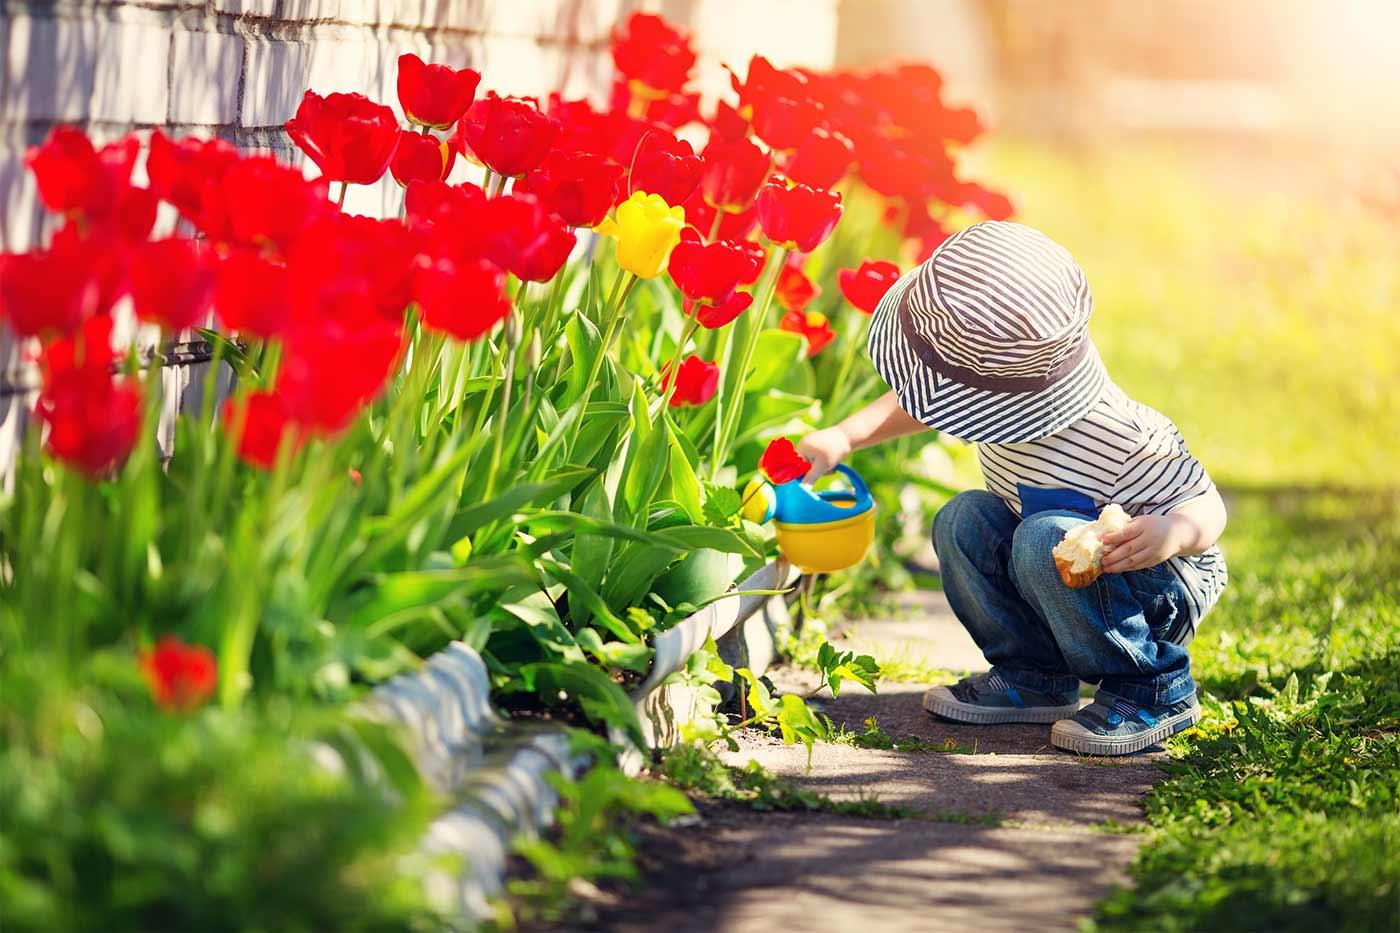 child watering flowers in a garden